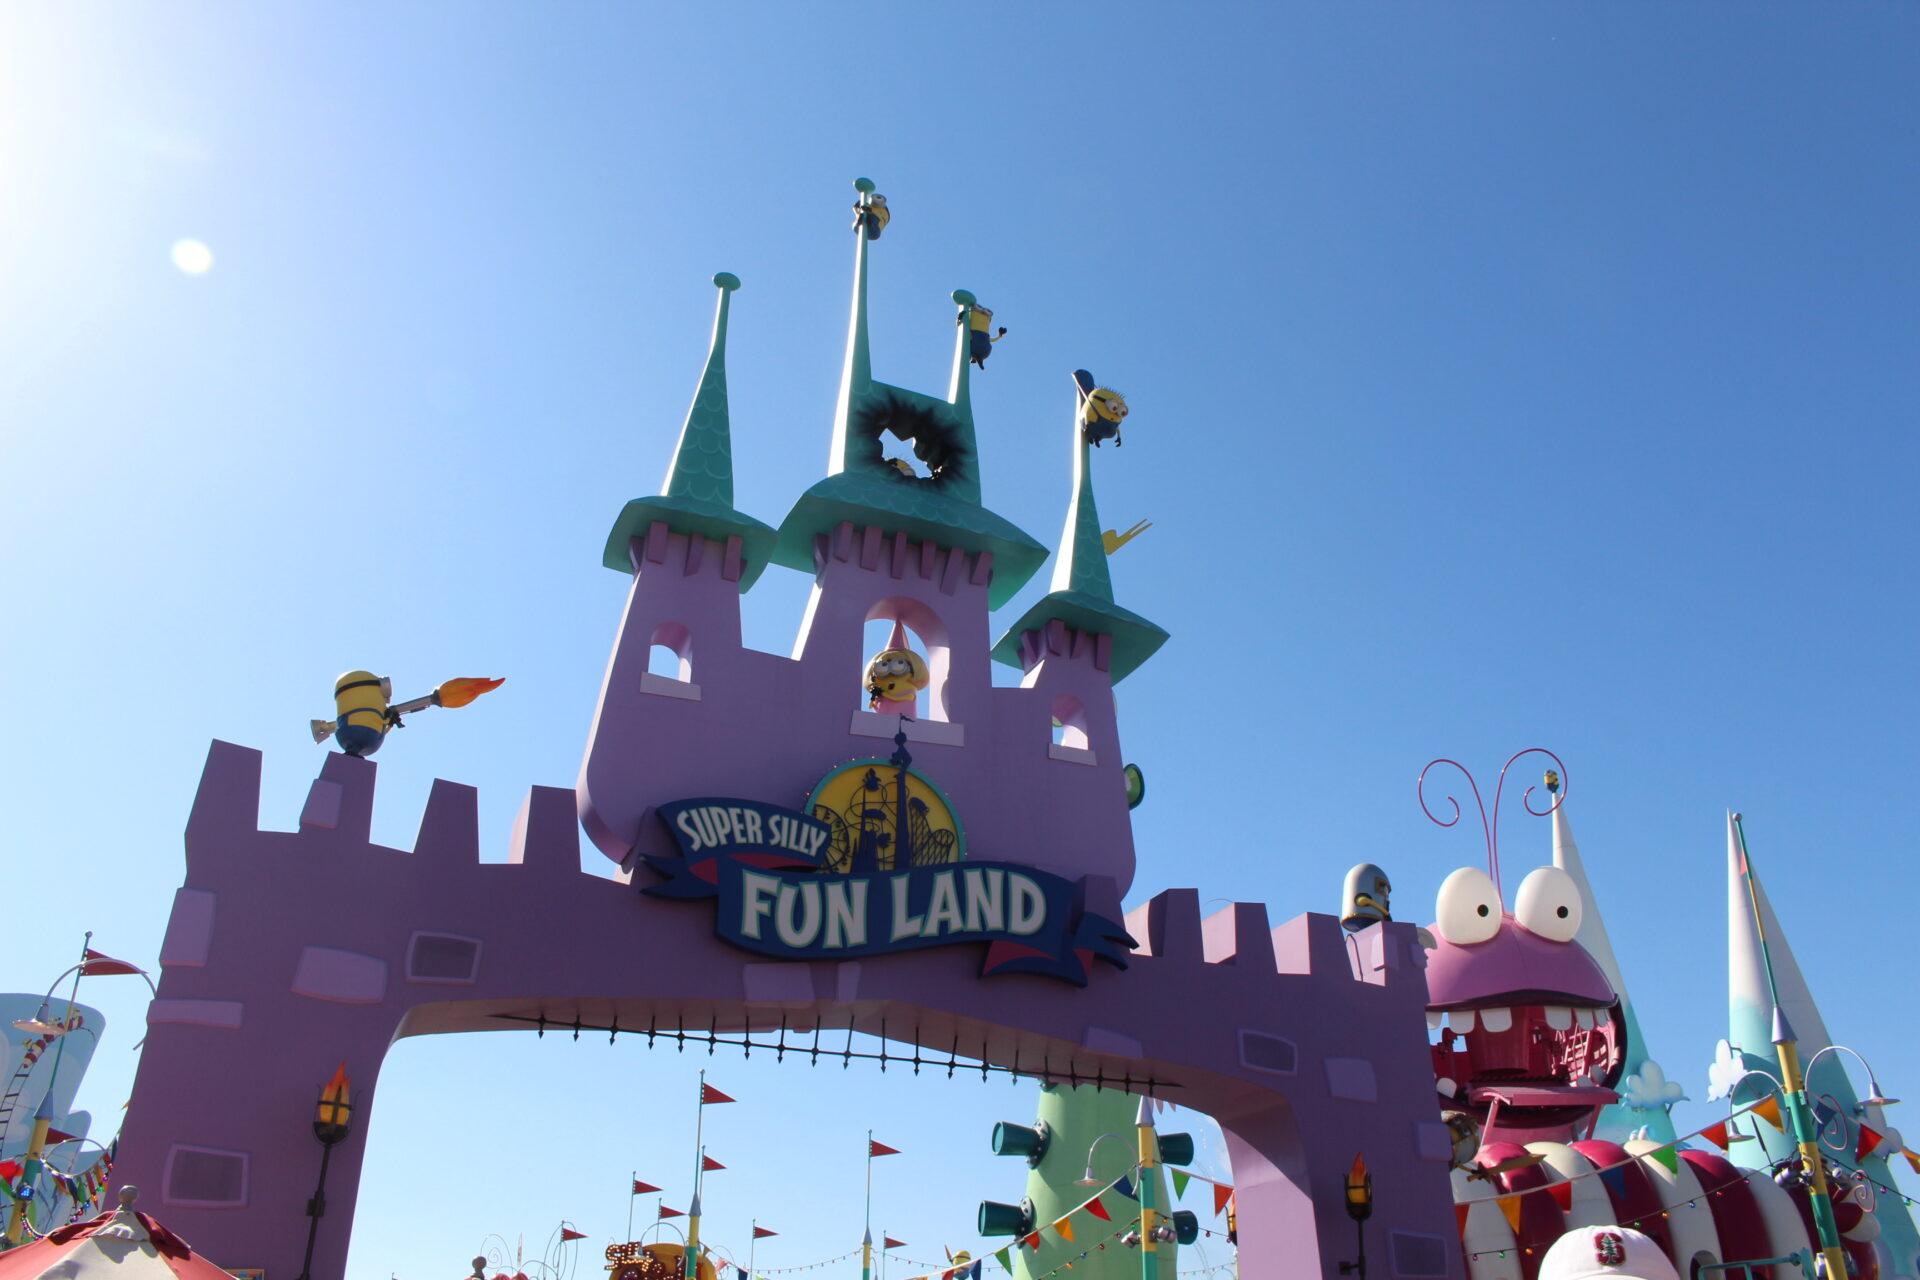 Universal Studios Hollywood - Silly Swirly Fun Land